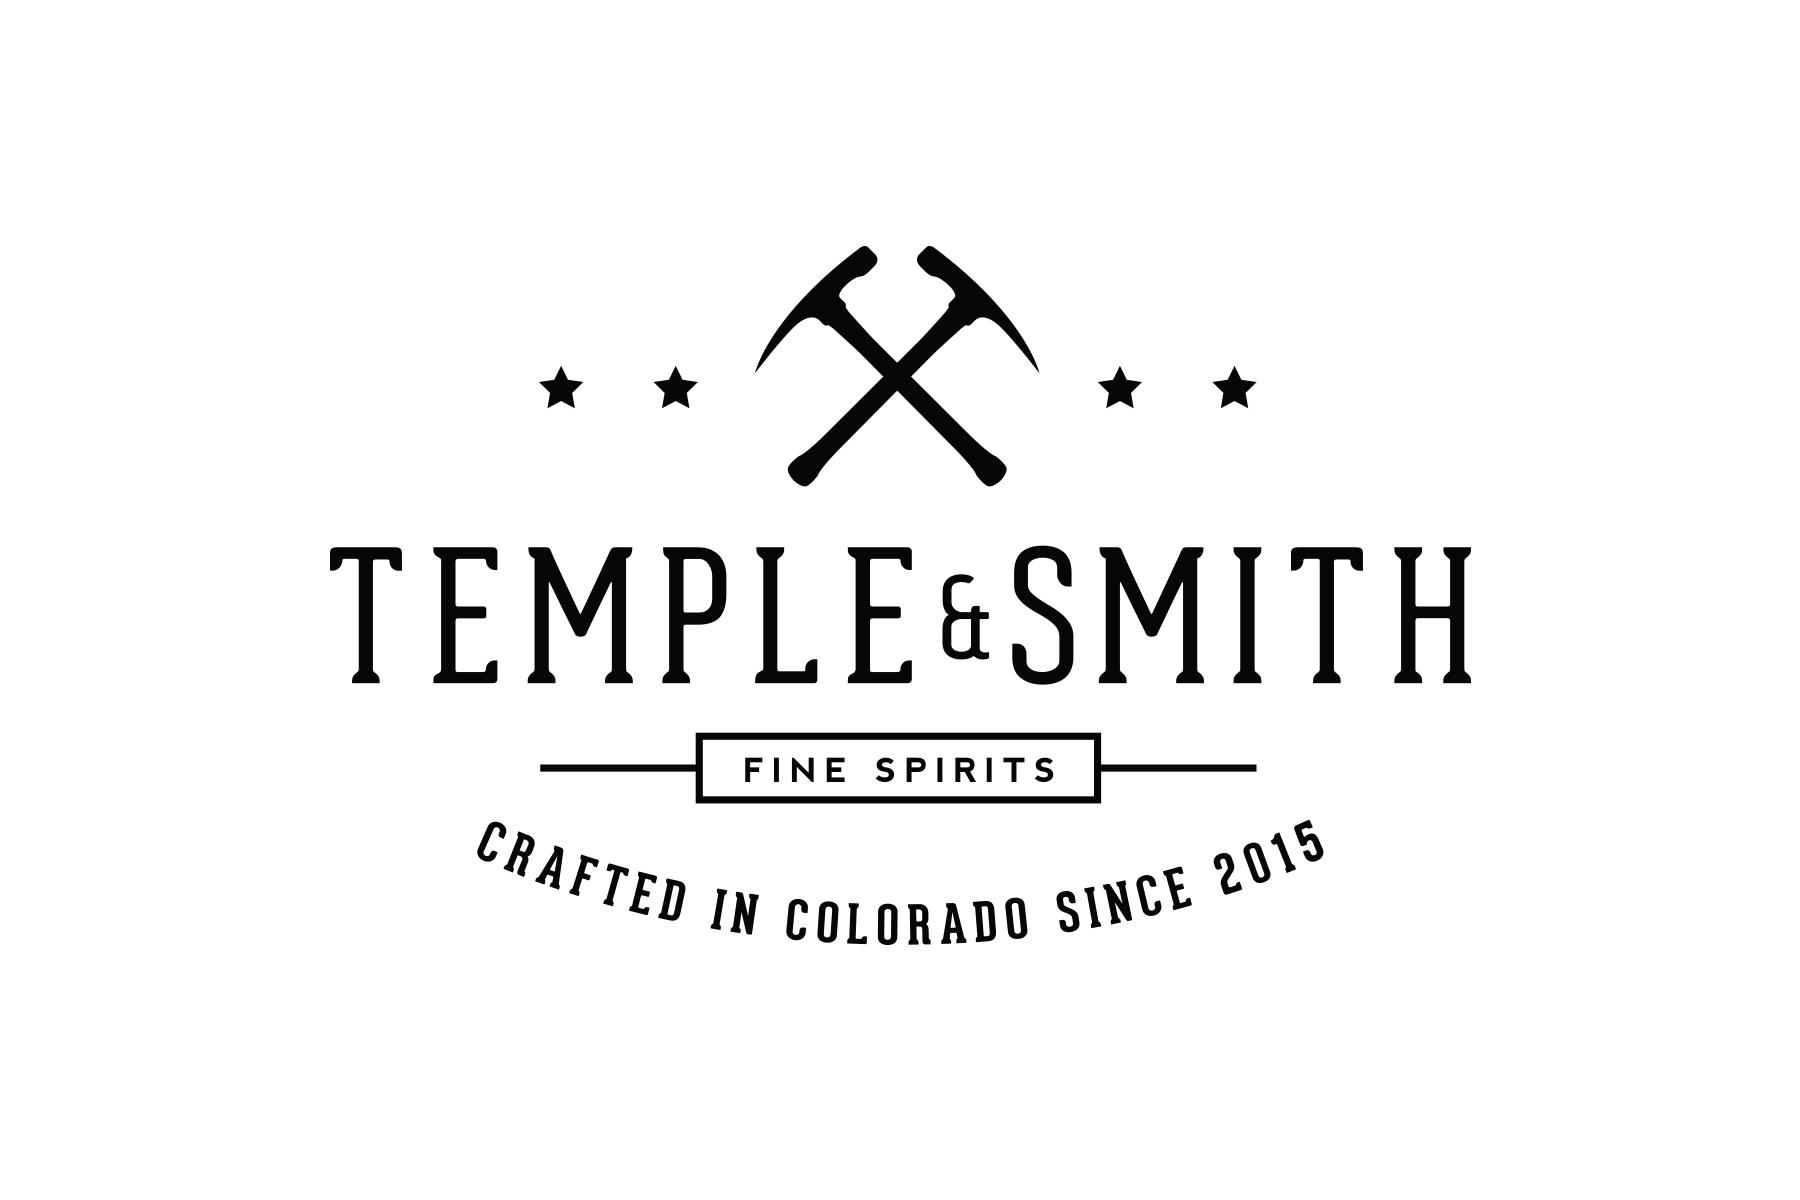 TempleSmith_6x4_ALT3.jpg